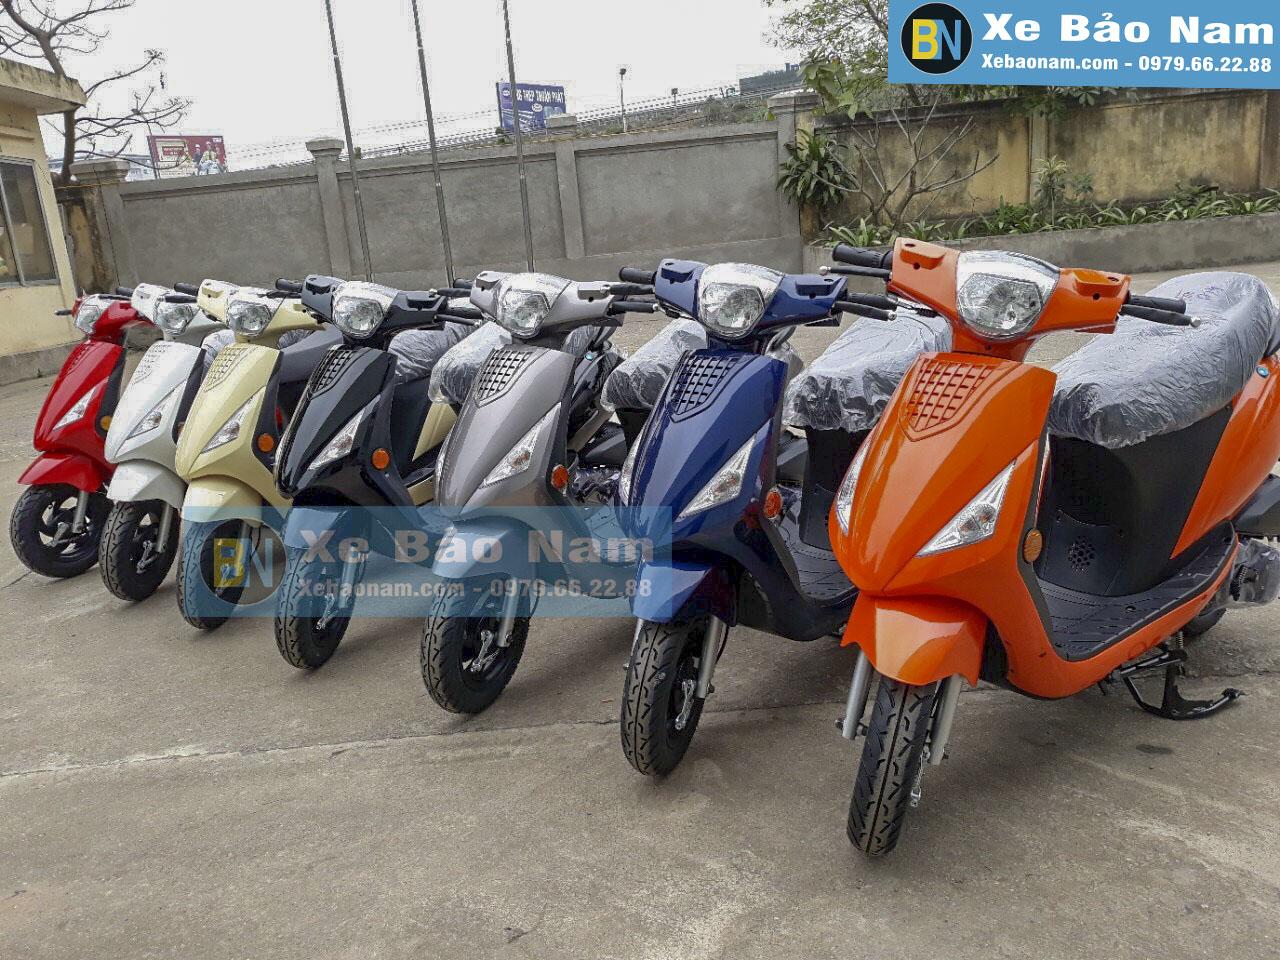 xe-may-zip-50cc-xebaonam-14